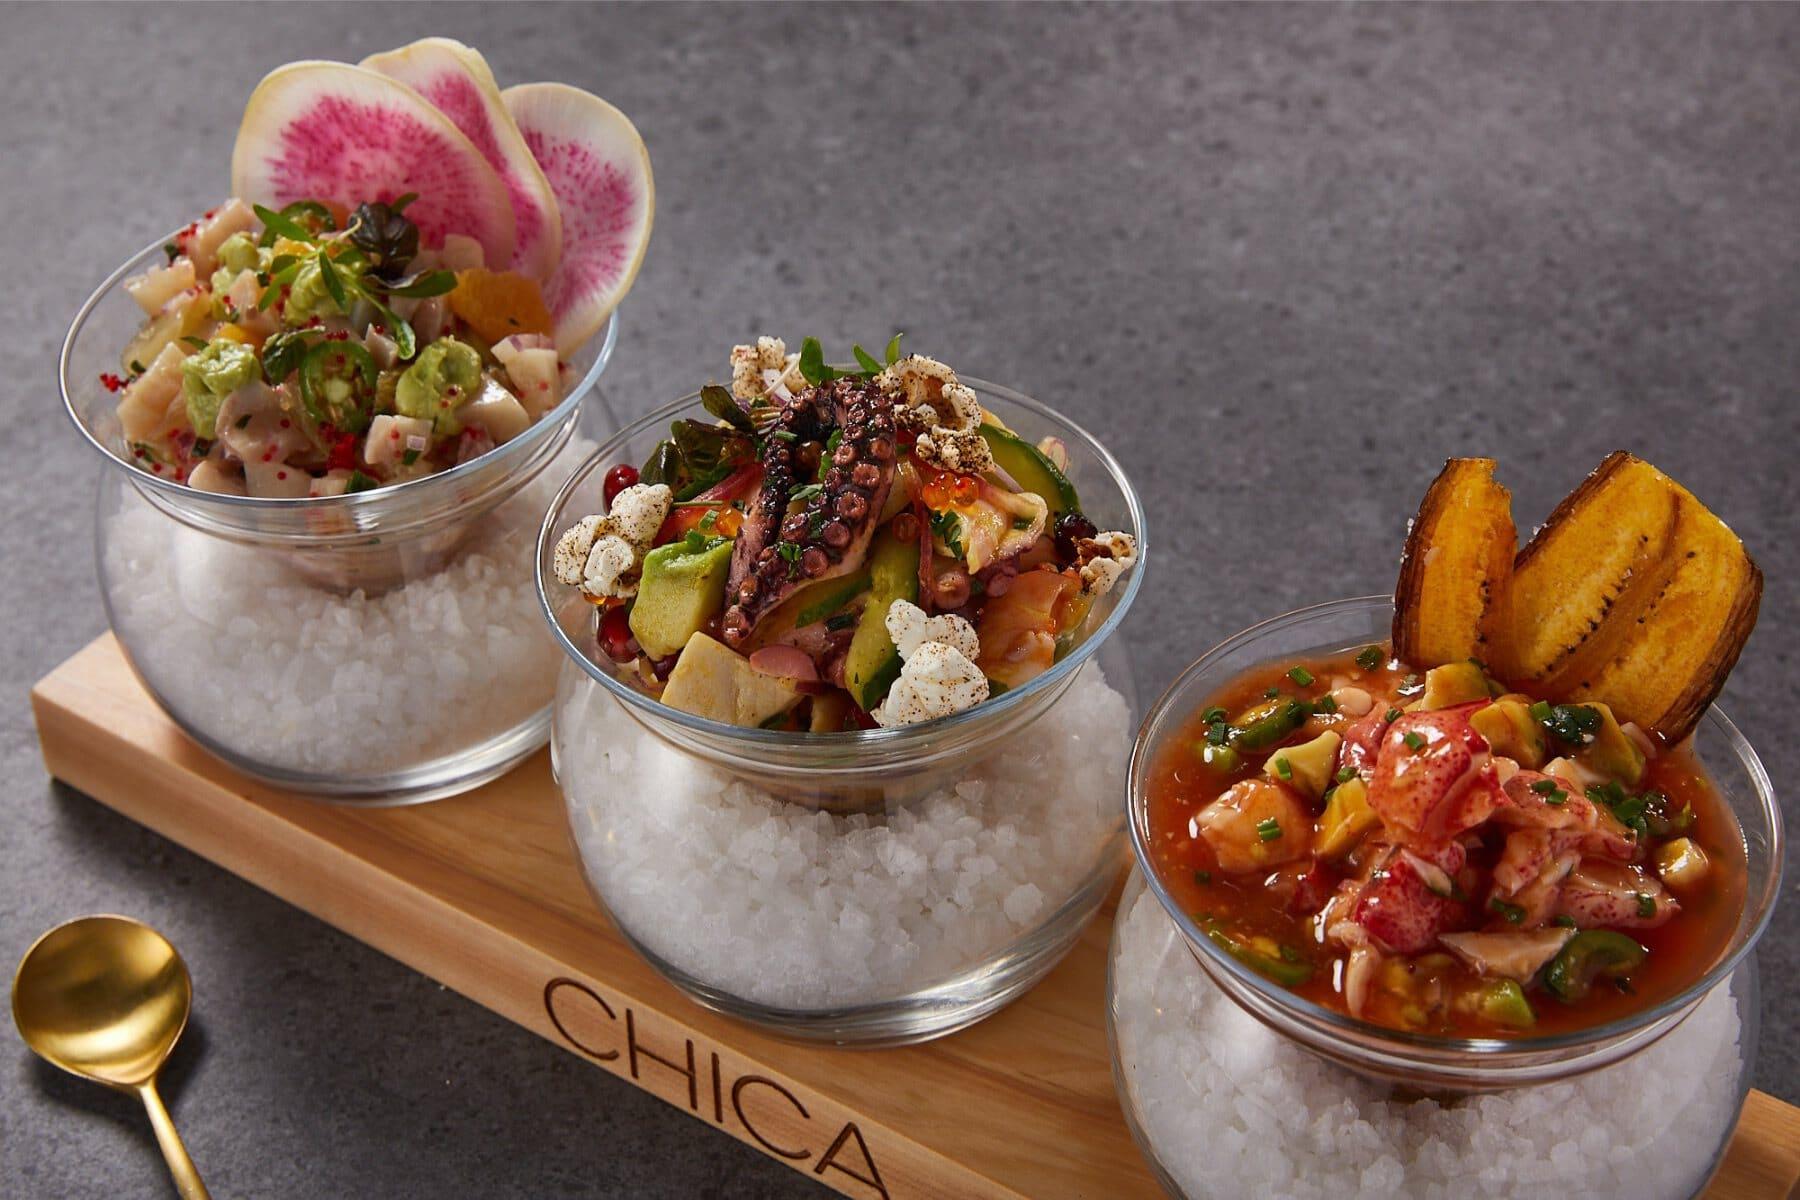 CHICA 11292018 CevicheSampler 0030